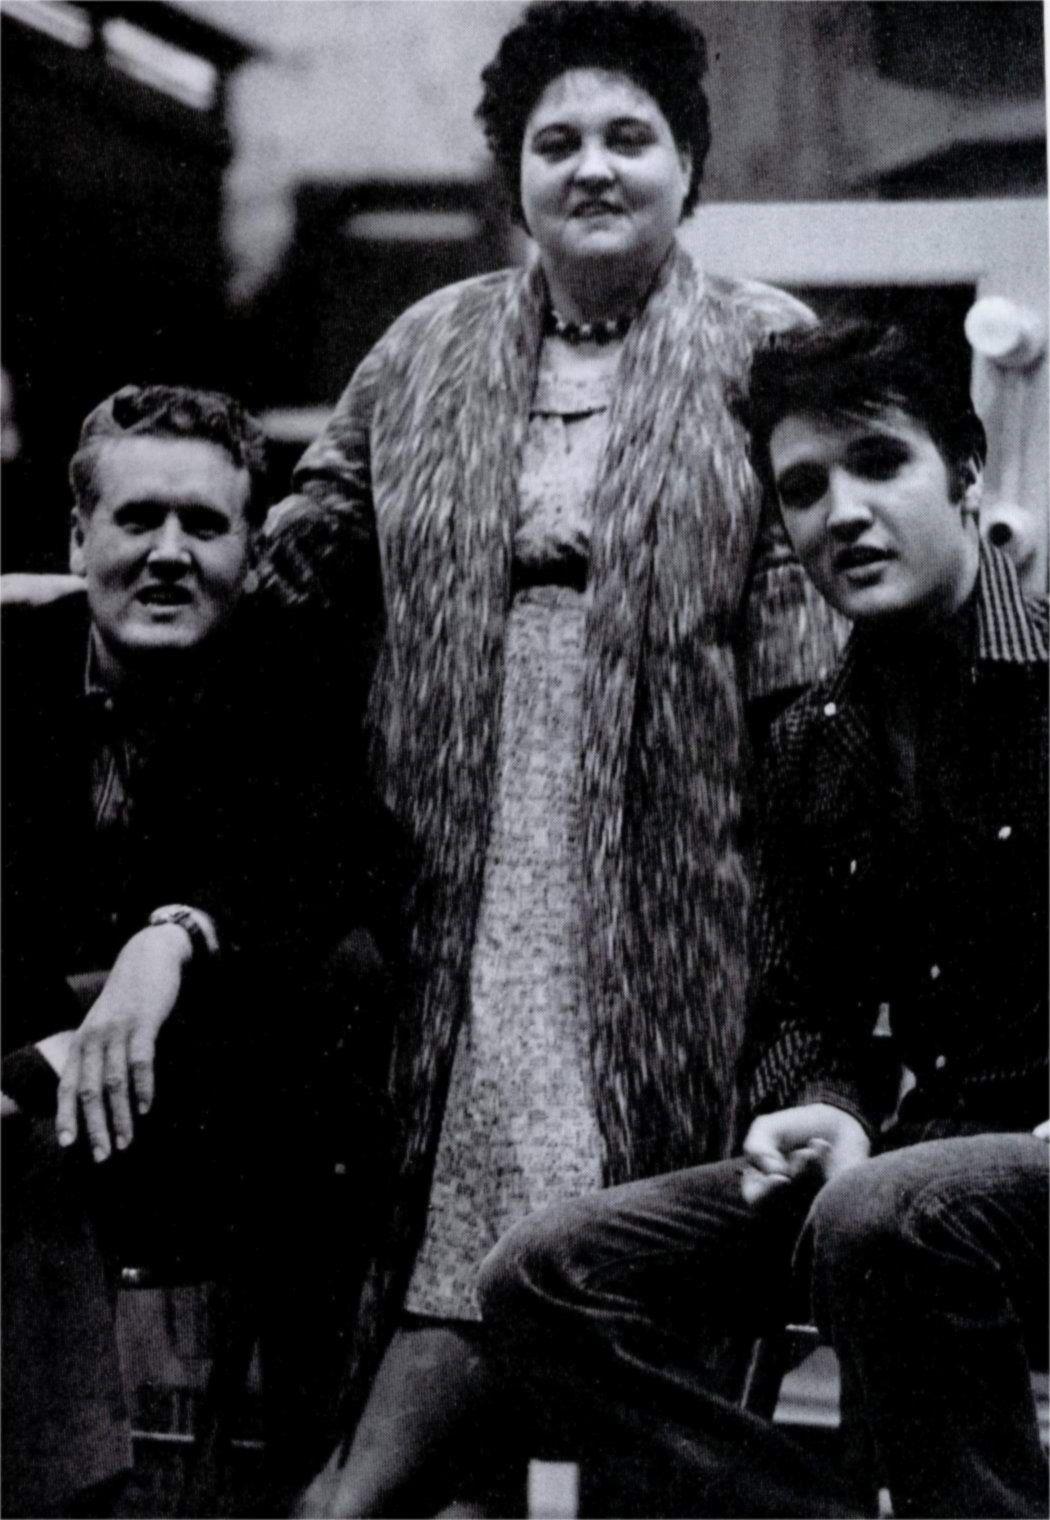 210 Elvis With Family ideas | elvis, elvis presley, elvis presley family